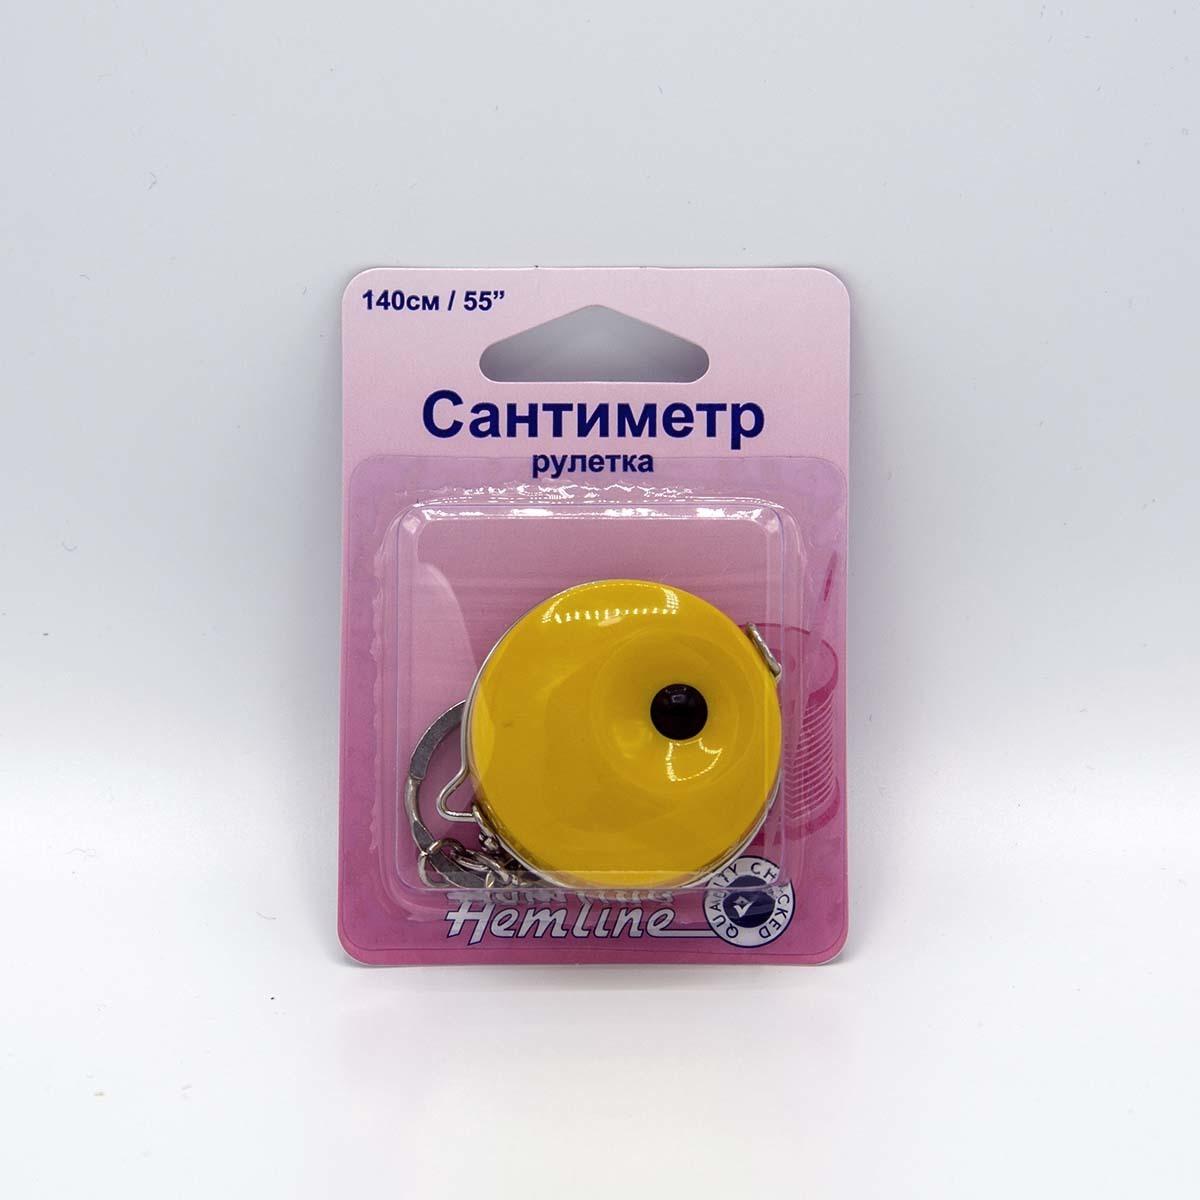 Сантиметр, рулетка с кольцом для ключей, Hemline